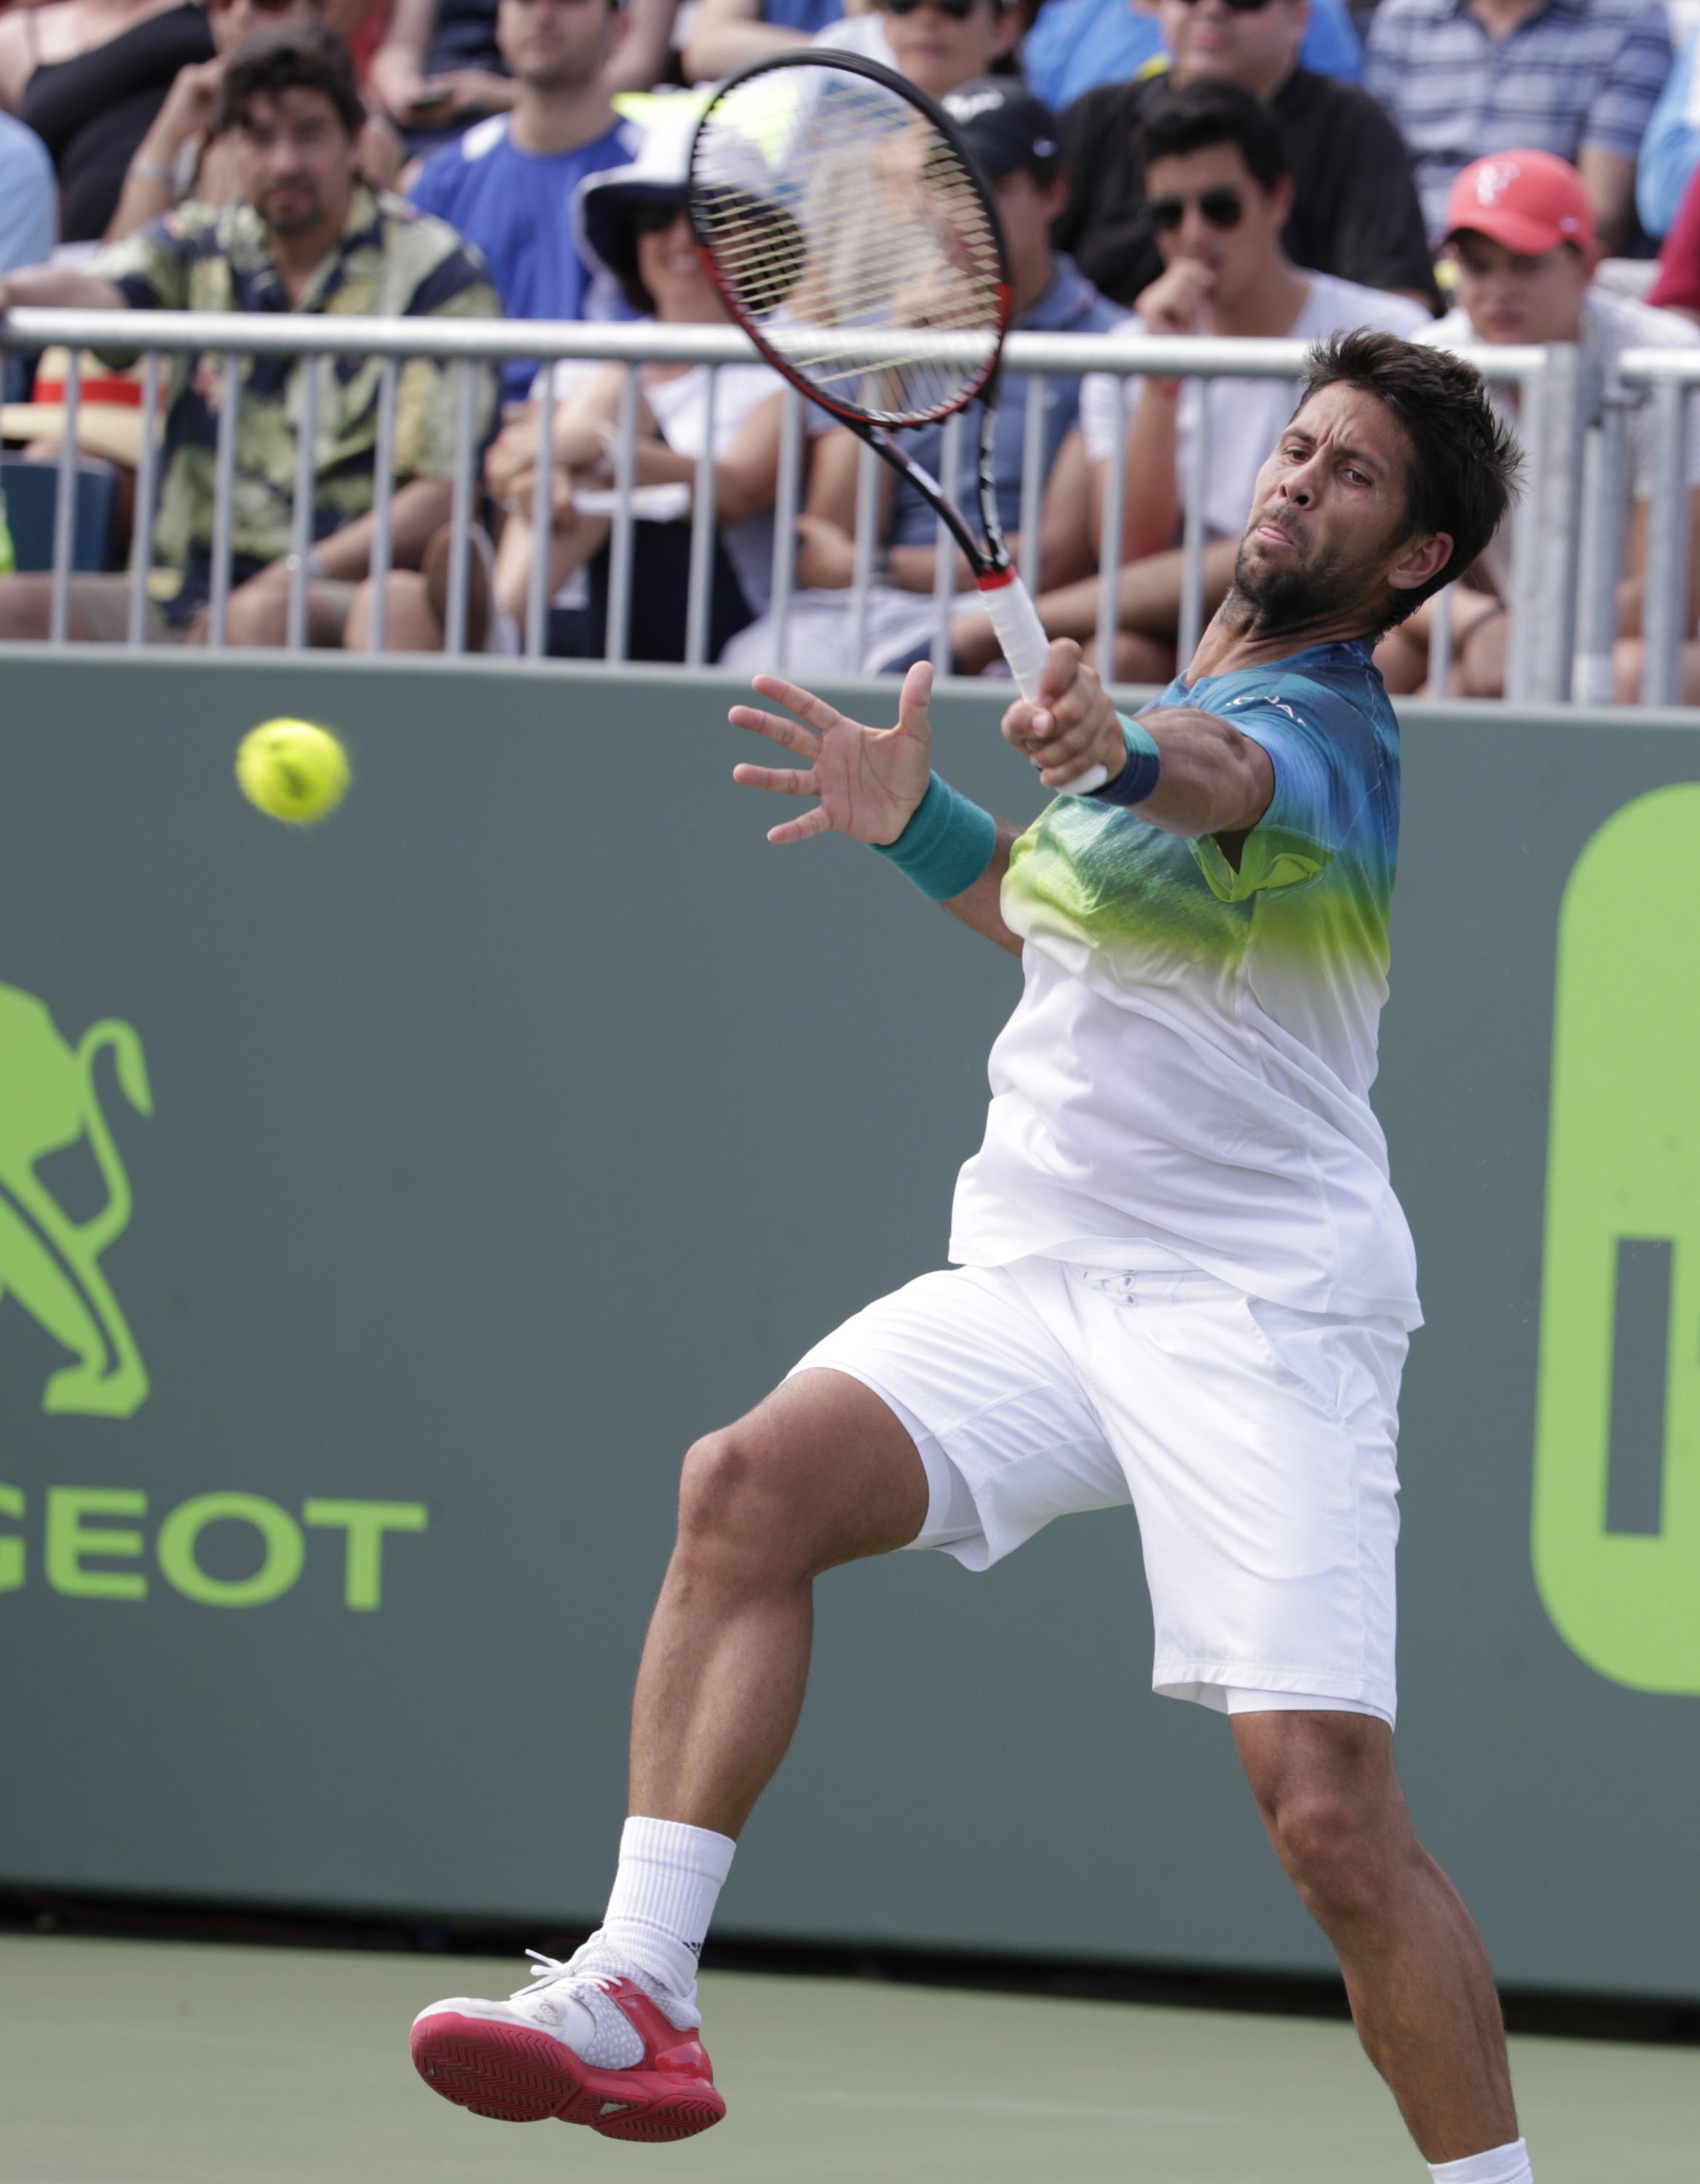 Fernando Verdasco, of Spain, returns to Horacio Zeballos during their match at the Miami Open tennis tournament, Sunday, March 27, 2016, in Key Biscayne, Fla. Zeballos won the match 1-6, 6-4, 7-6 (4). (AP Photo/Lynne Sladky)